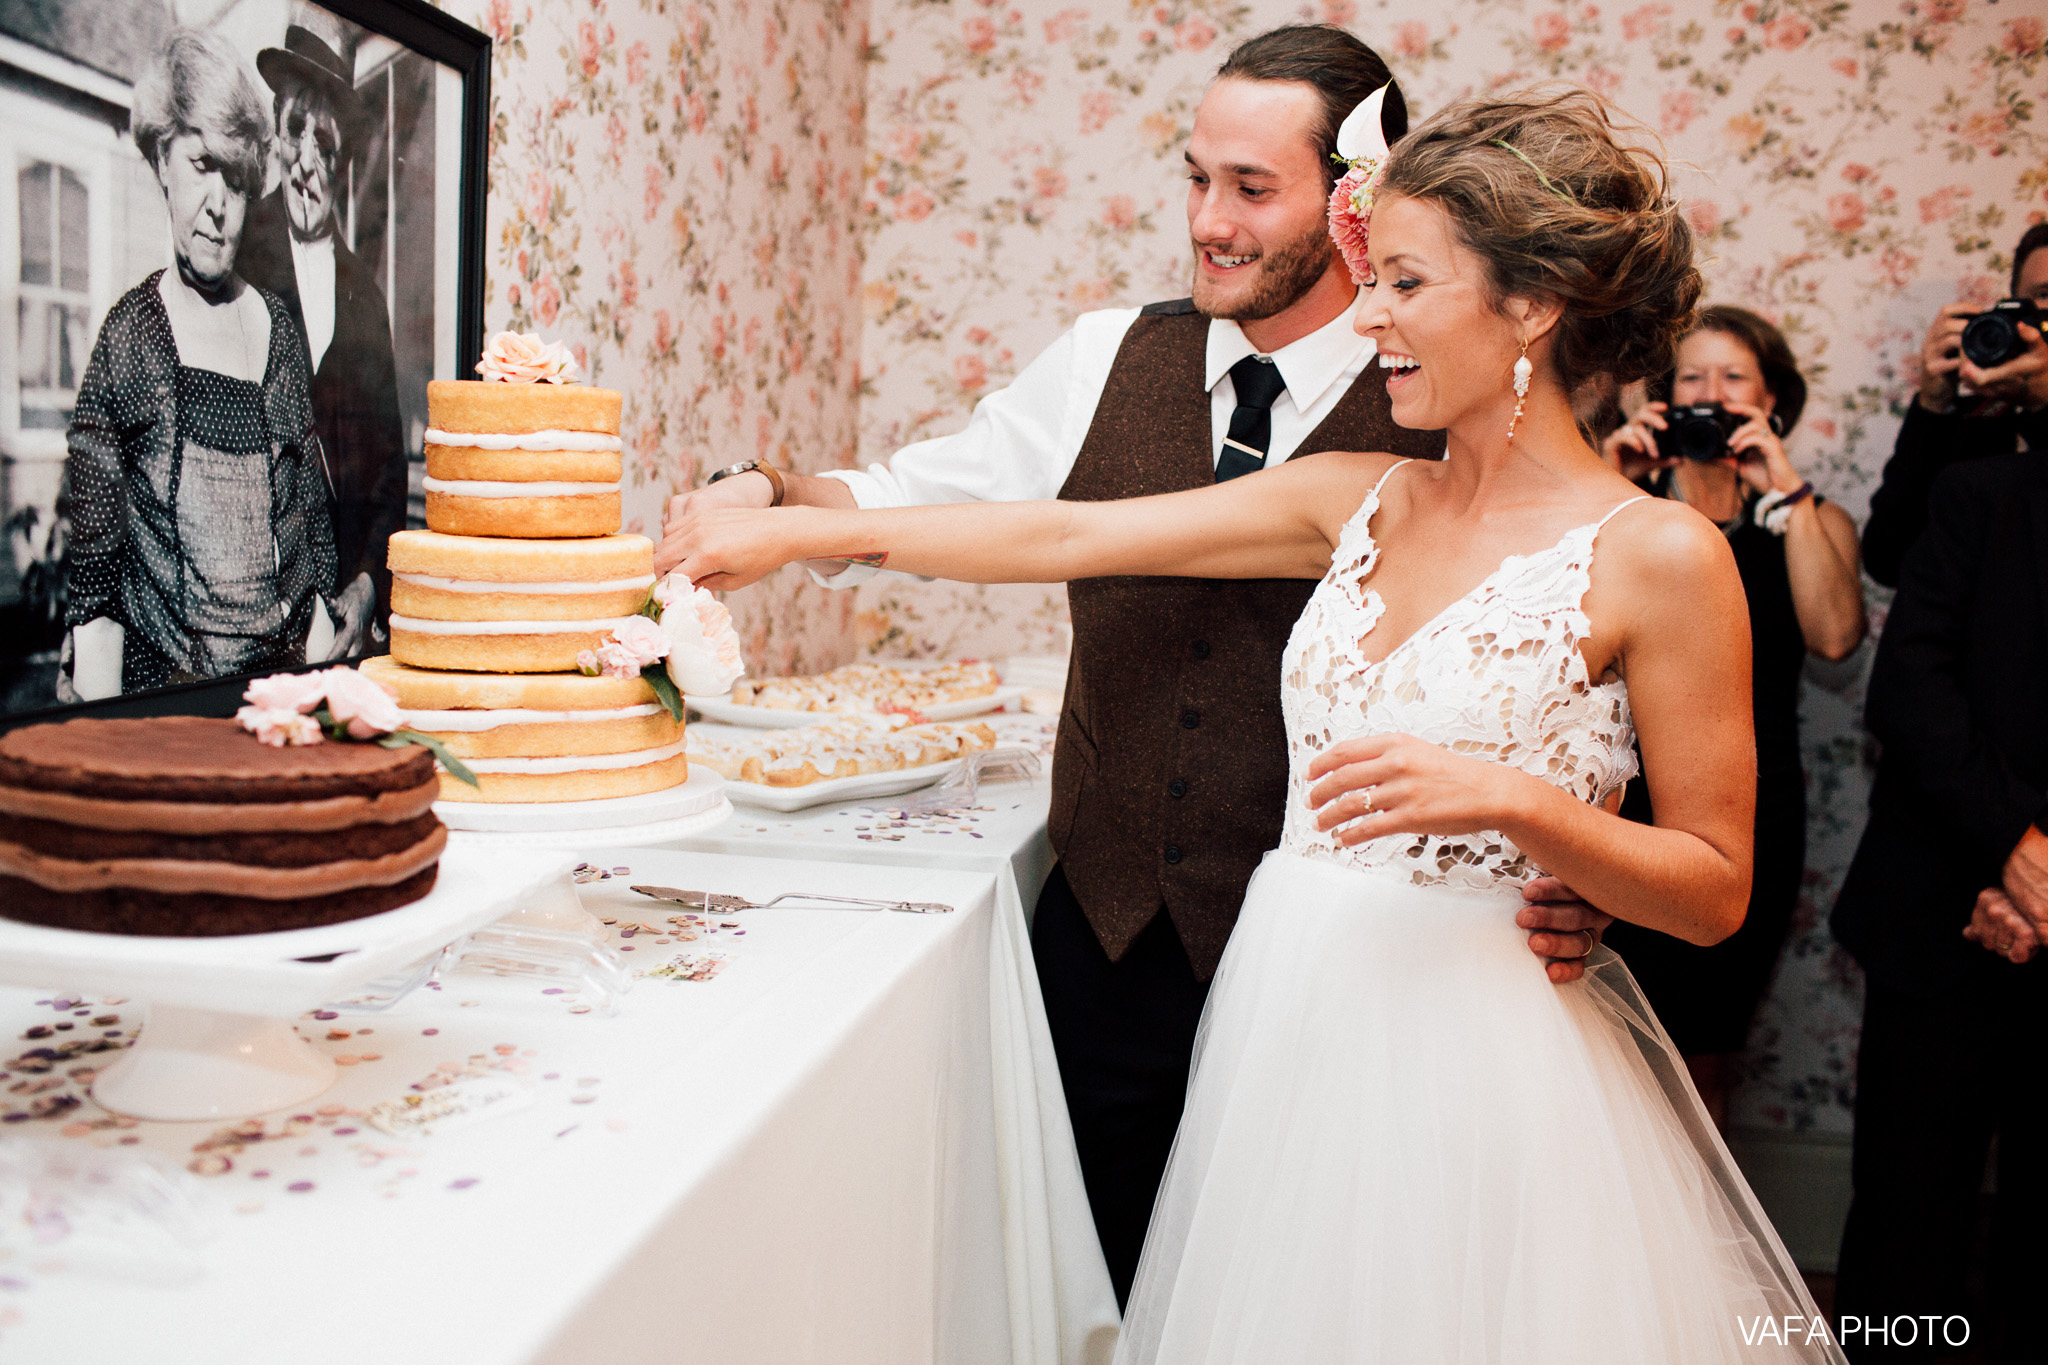 The-Felt-Estate-Wedding-Kailie-David-Vafa-Photo-1017.jpg